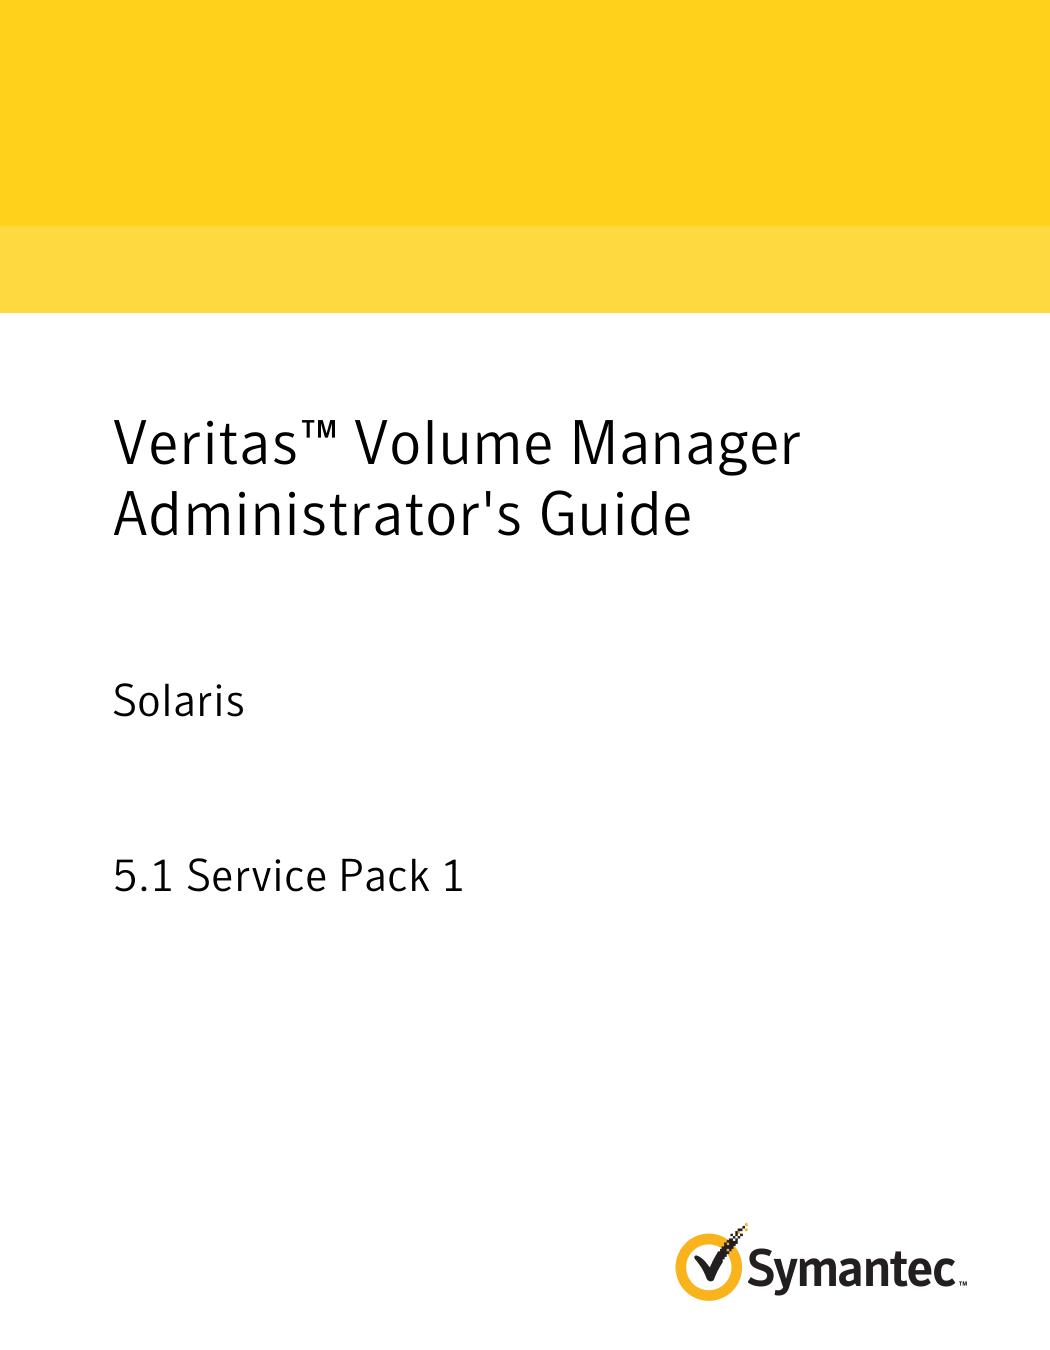 Veritas™ Volume Manager Administrator`s Guide: Solaris | manualzz com